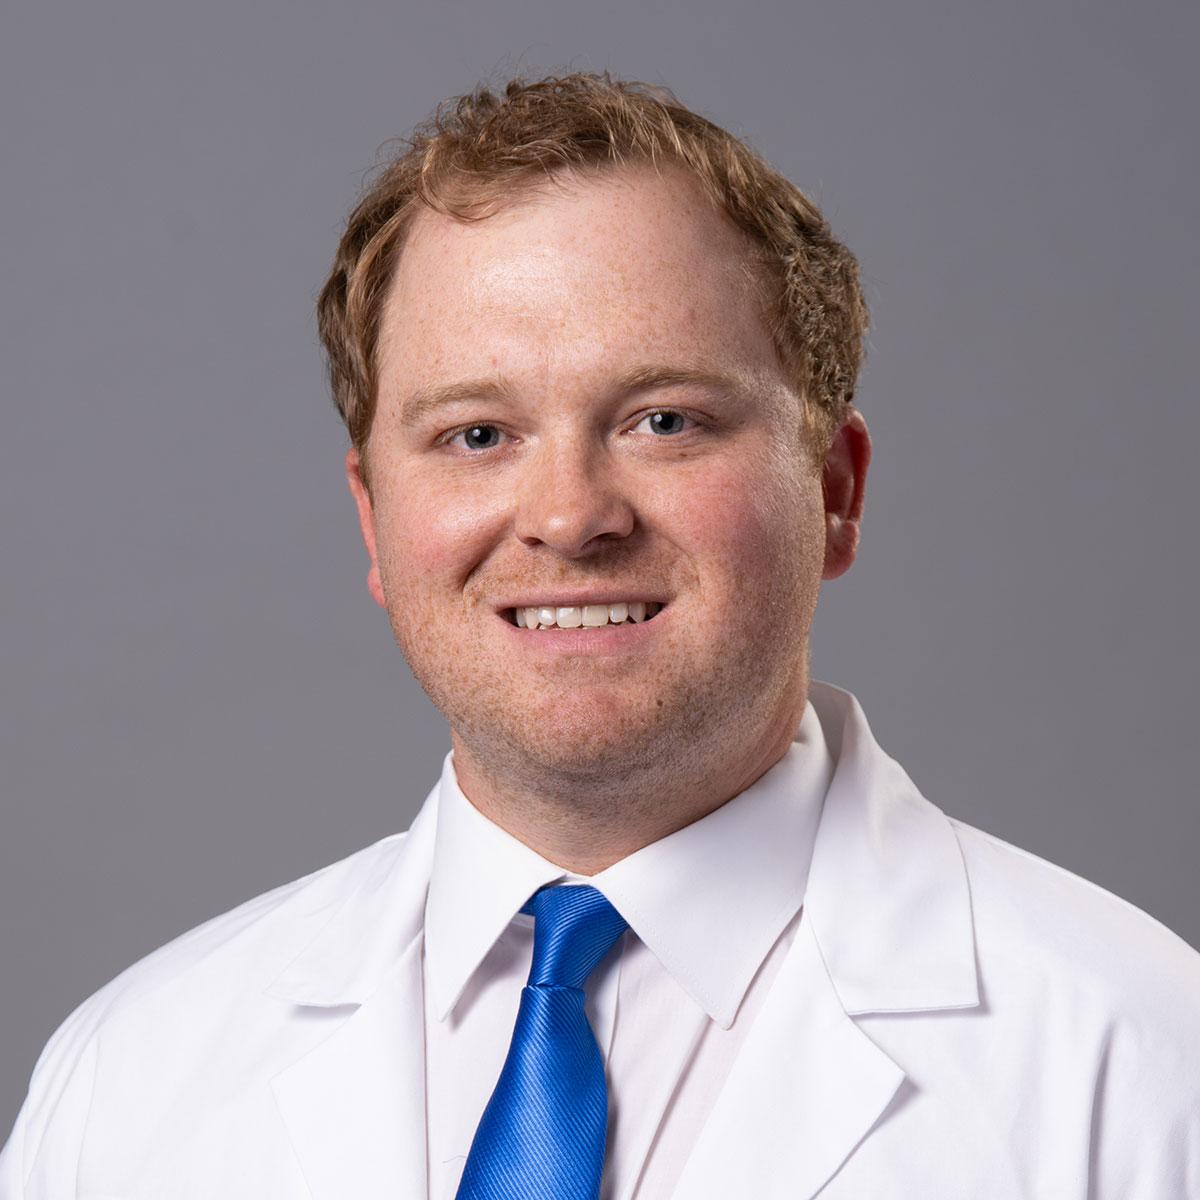 A friendly headshot of Dr. Thomas Godwin